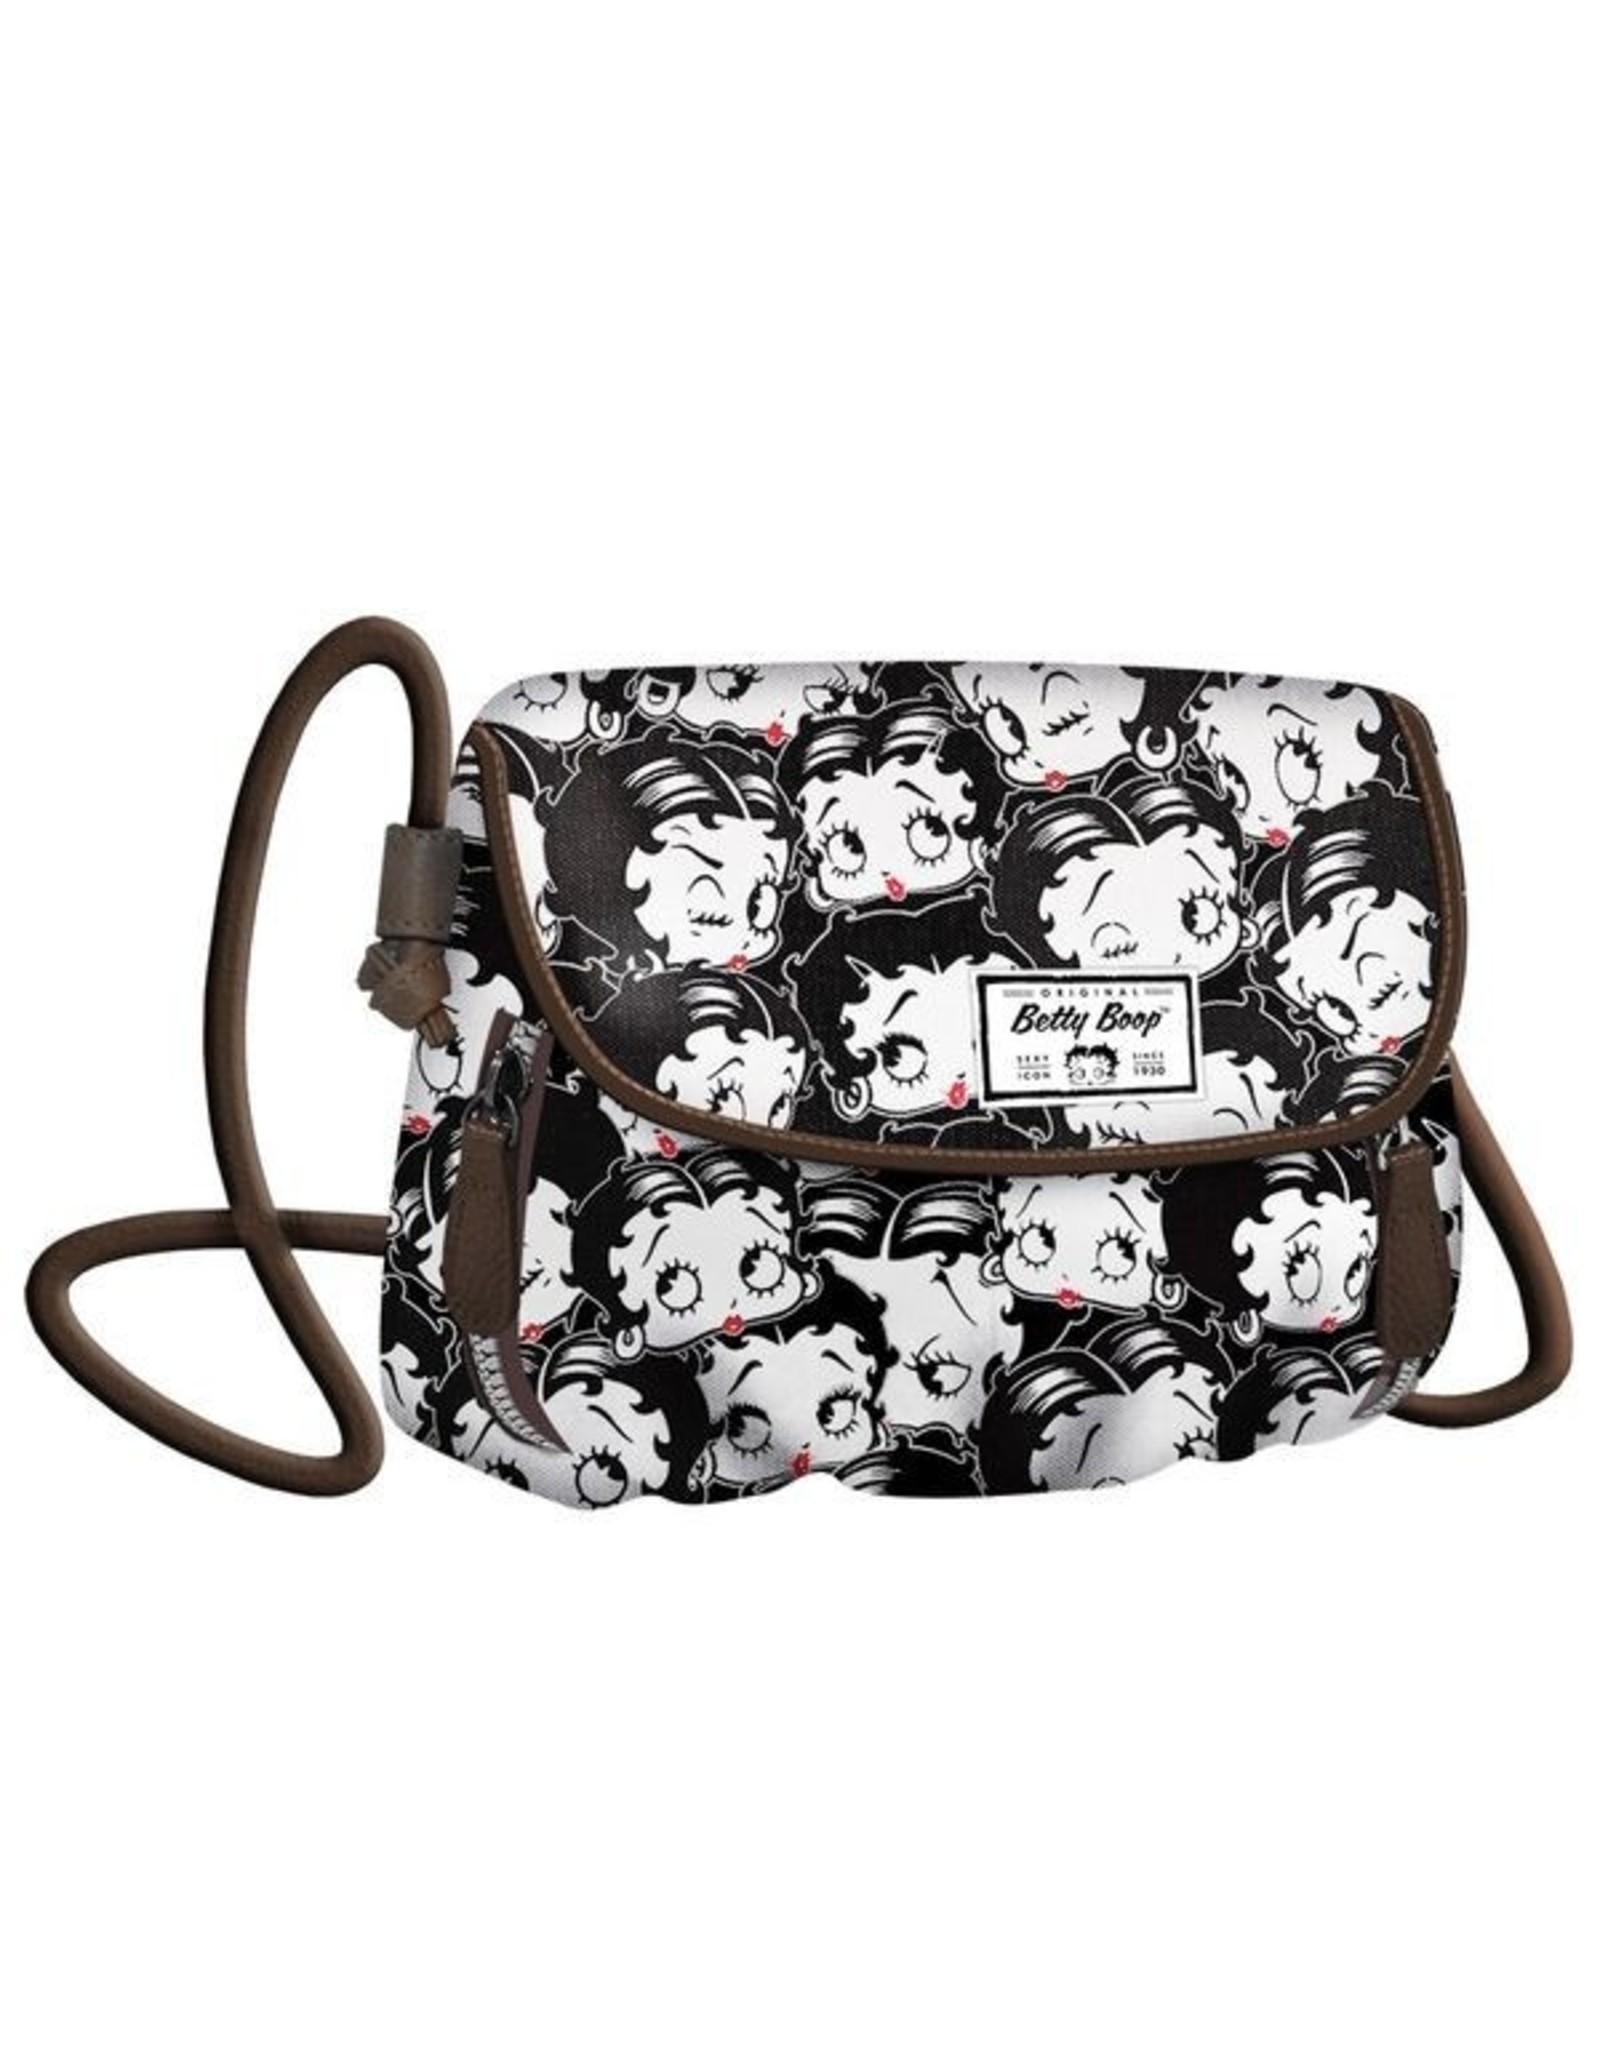 Betty Boop Merchandise bags - Betty Boop Shoulder bag Clamy red